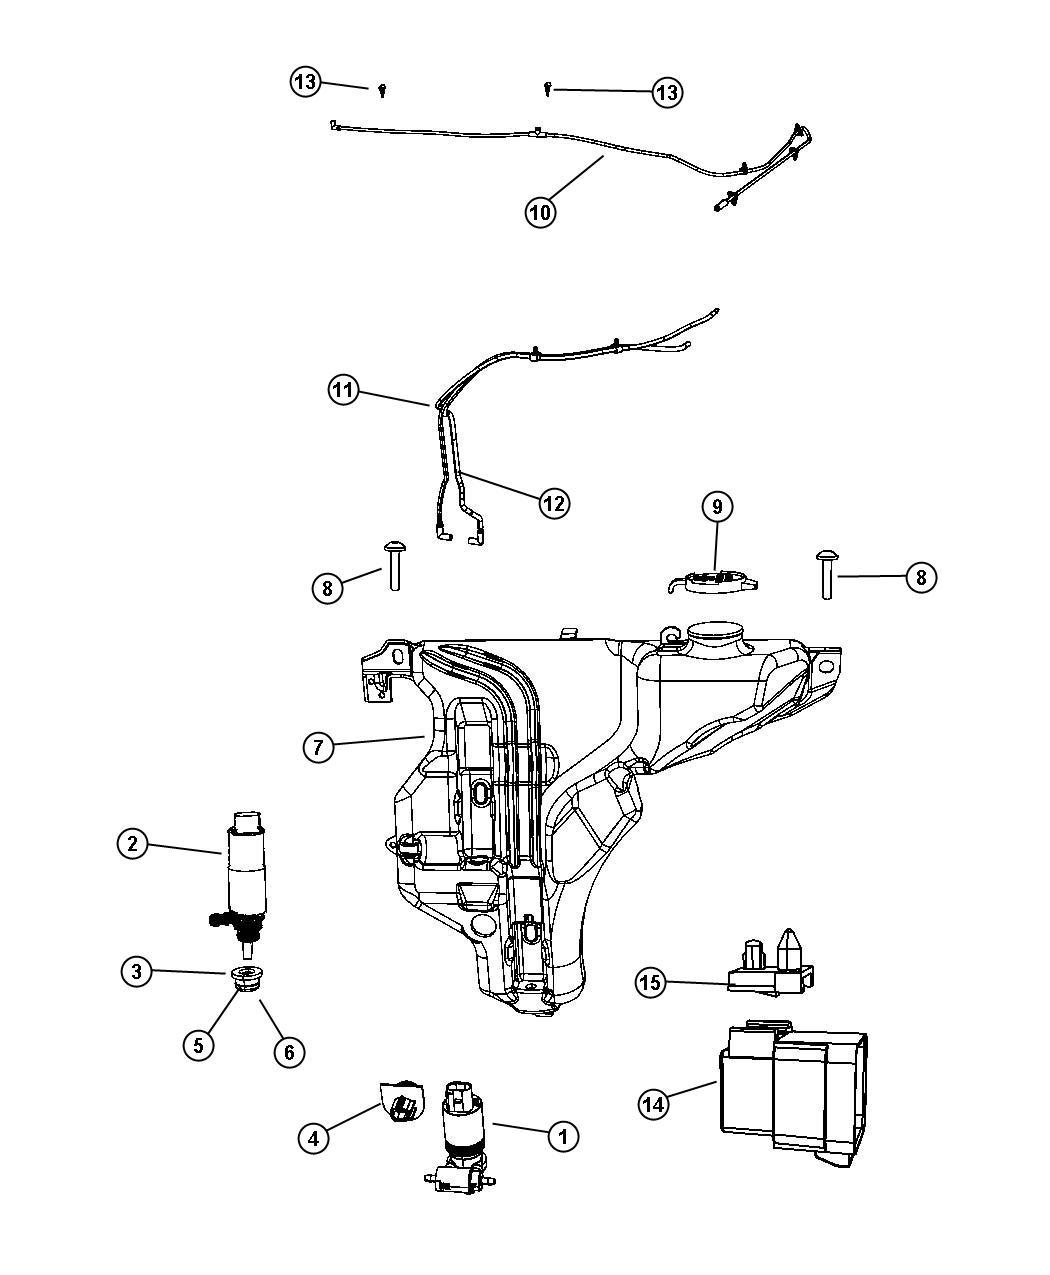 2009 Dodge Journey Front Washer System